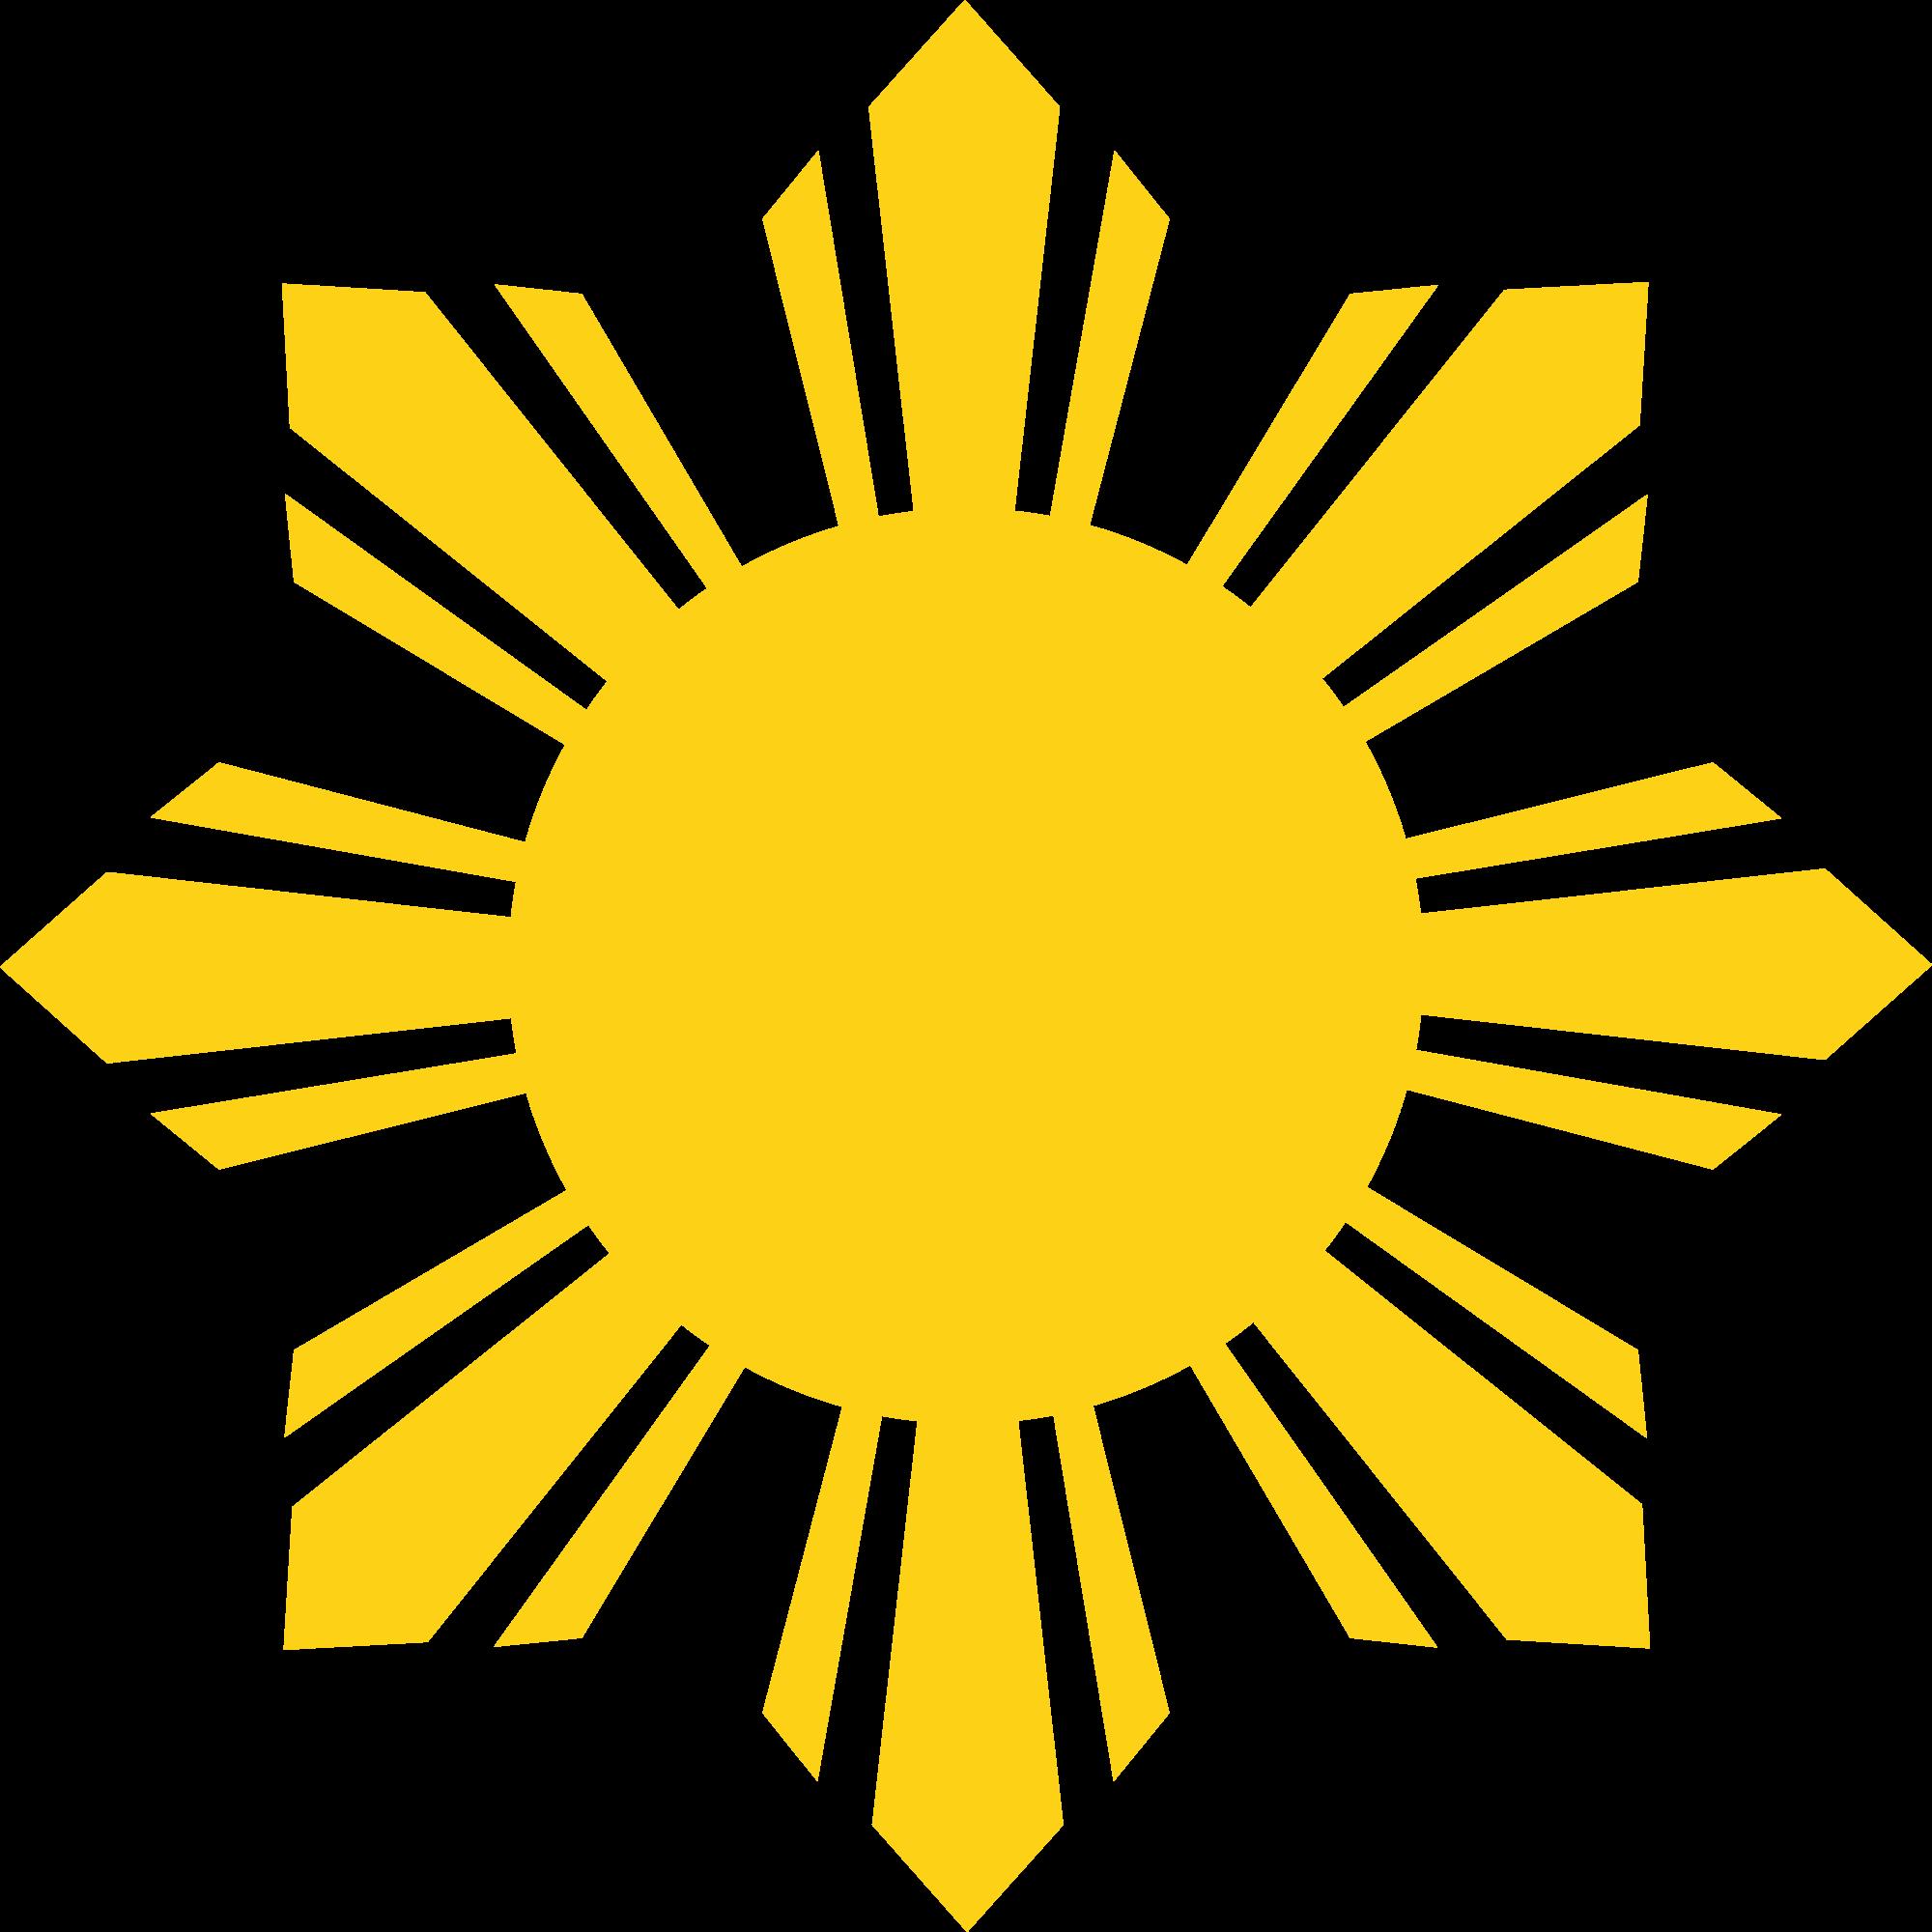 Images For Filipino Cultural Symbols